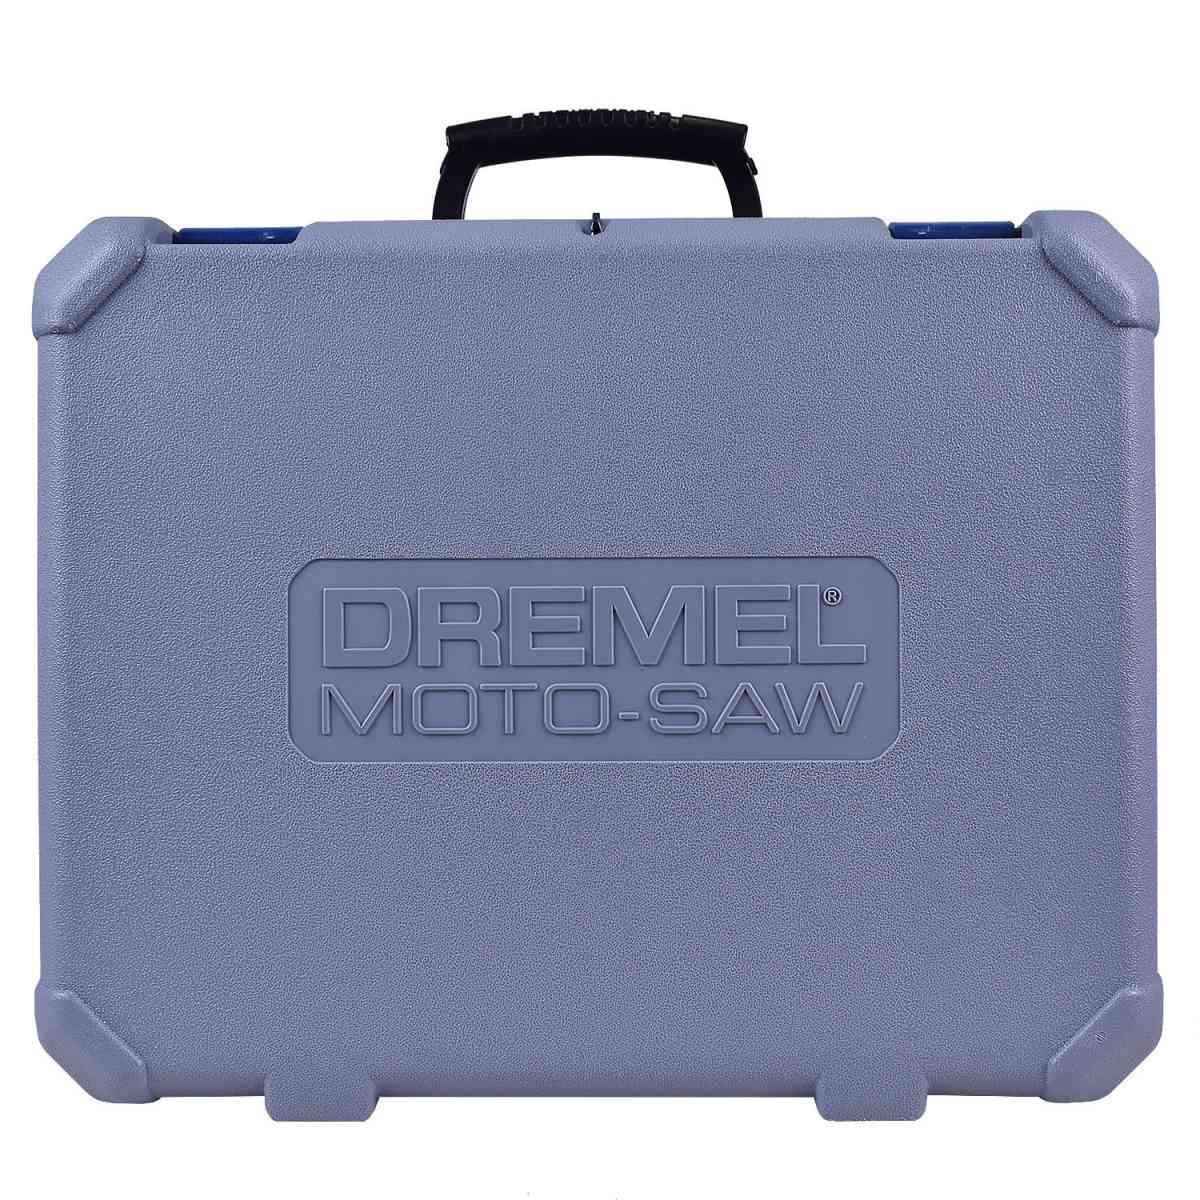 Serra Tico Tico de Bancada Portátil Moto-Saw - Dremel